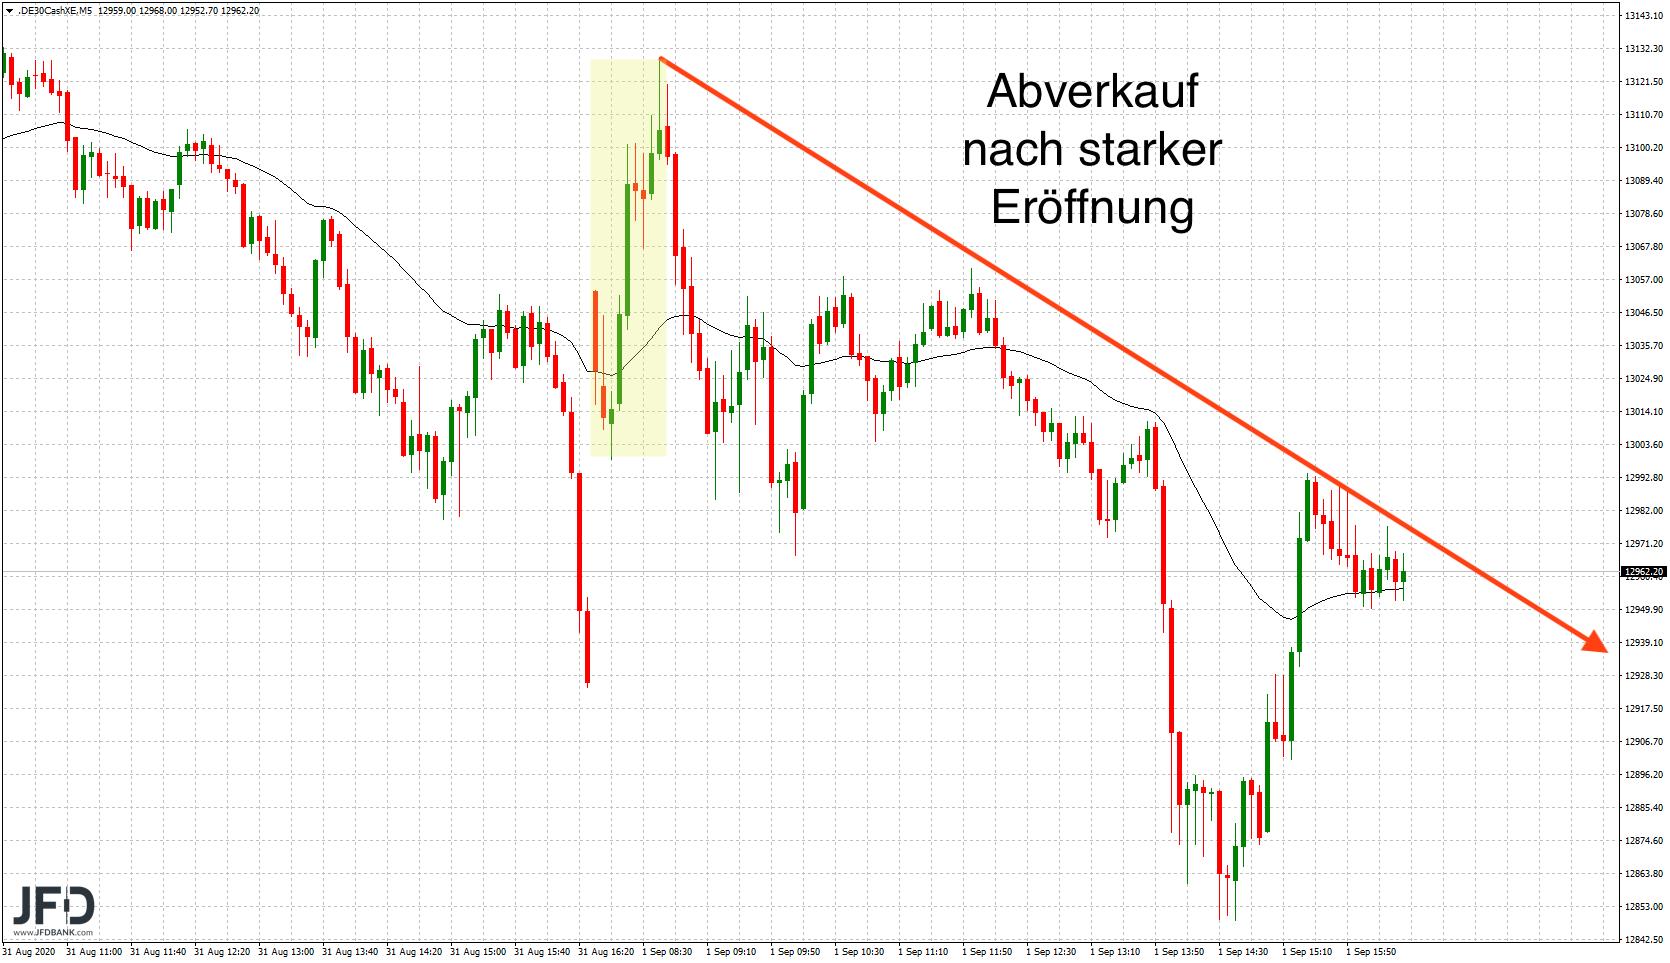 DAX-volatil-in-den-September-gestartet-Kommentar-JFD-Bank-GodmodeTrader.de-3